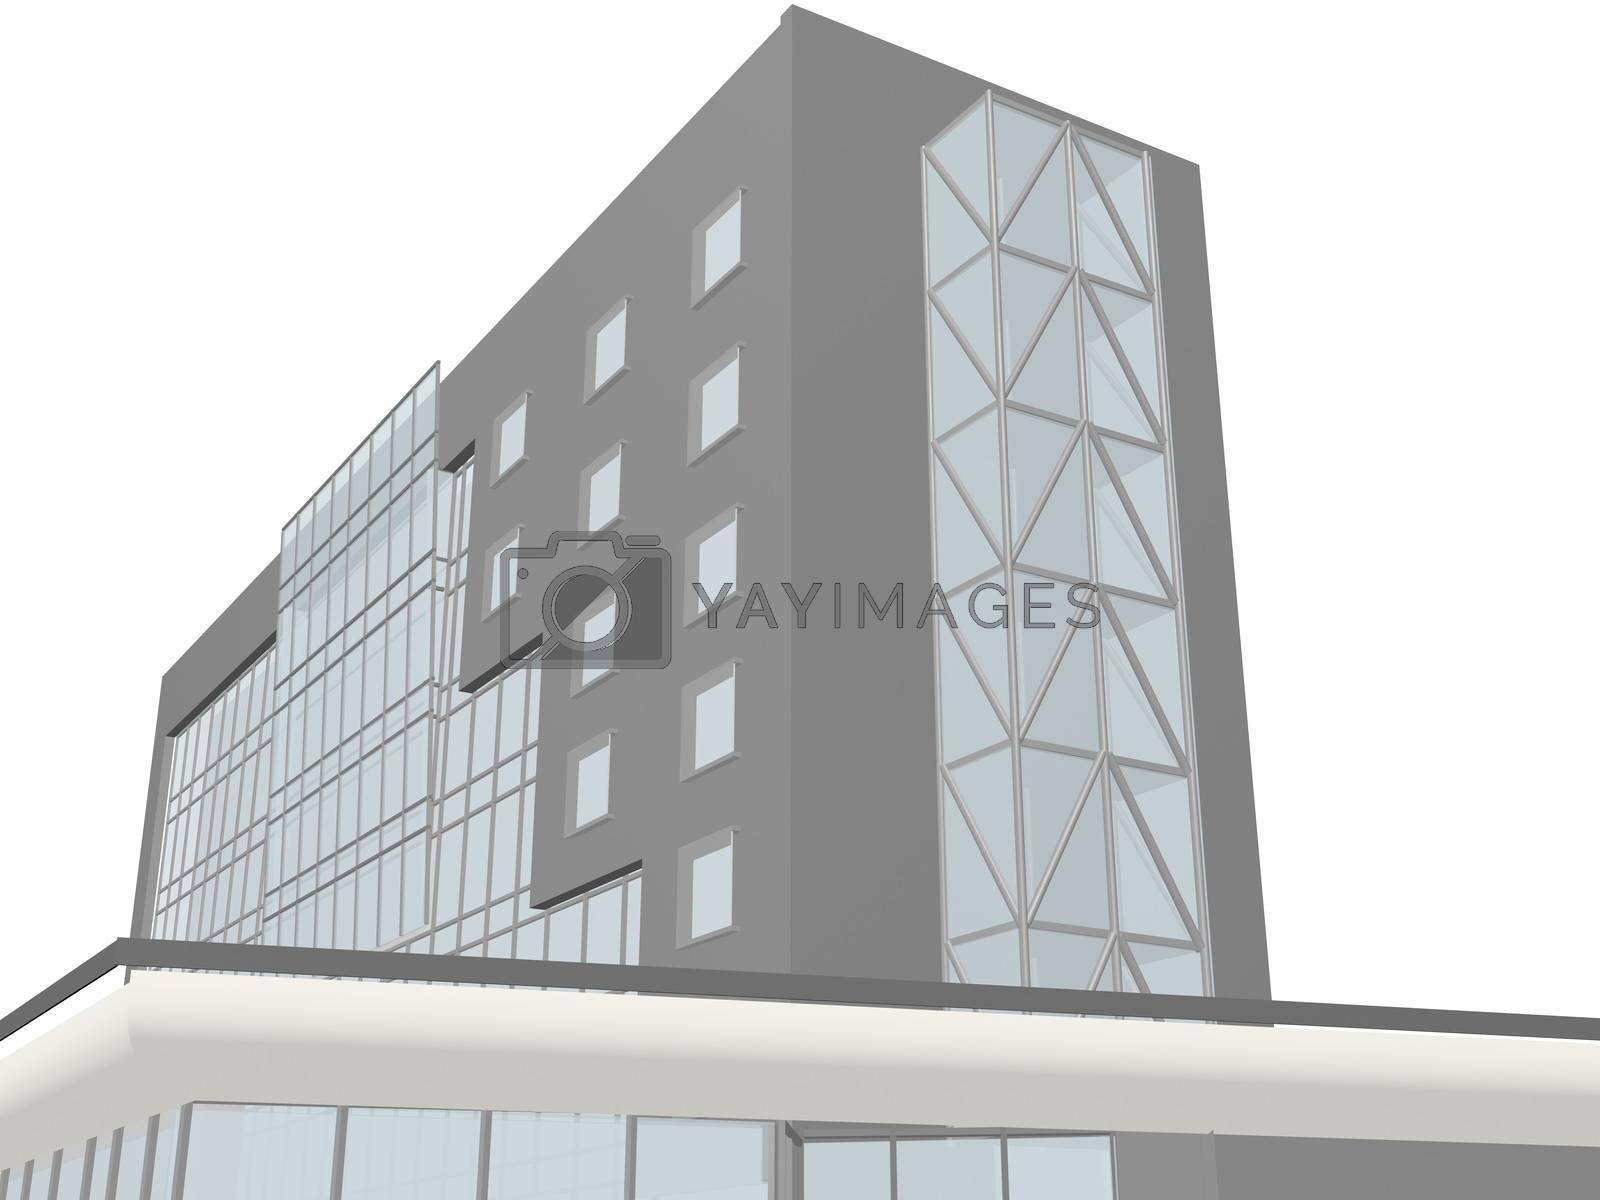 Architecture project 3d model vizualization building by Prokopenko